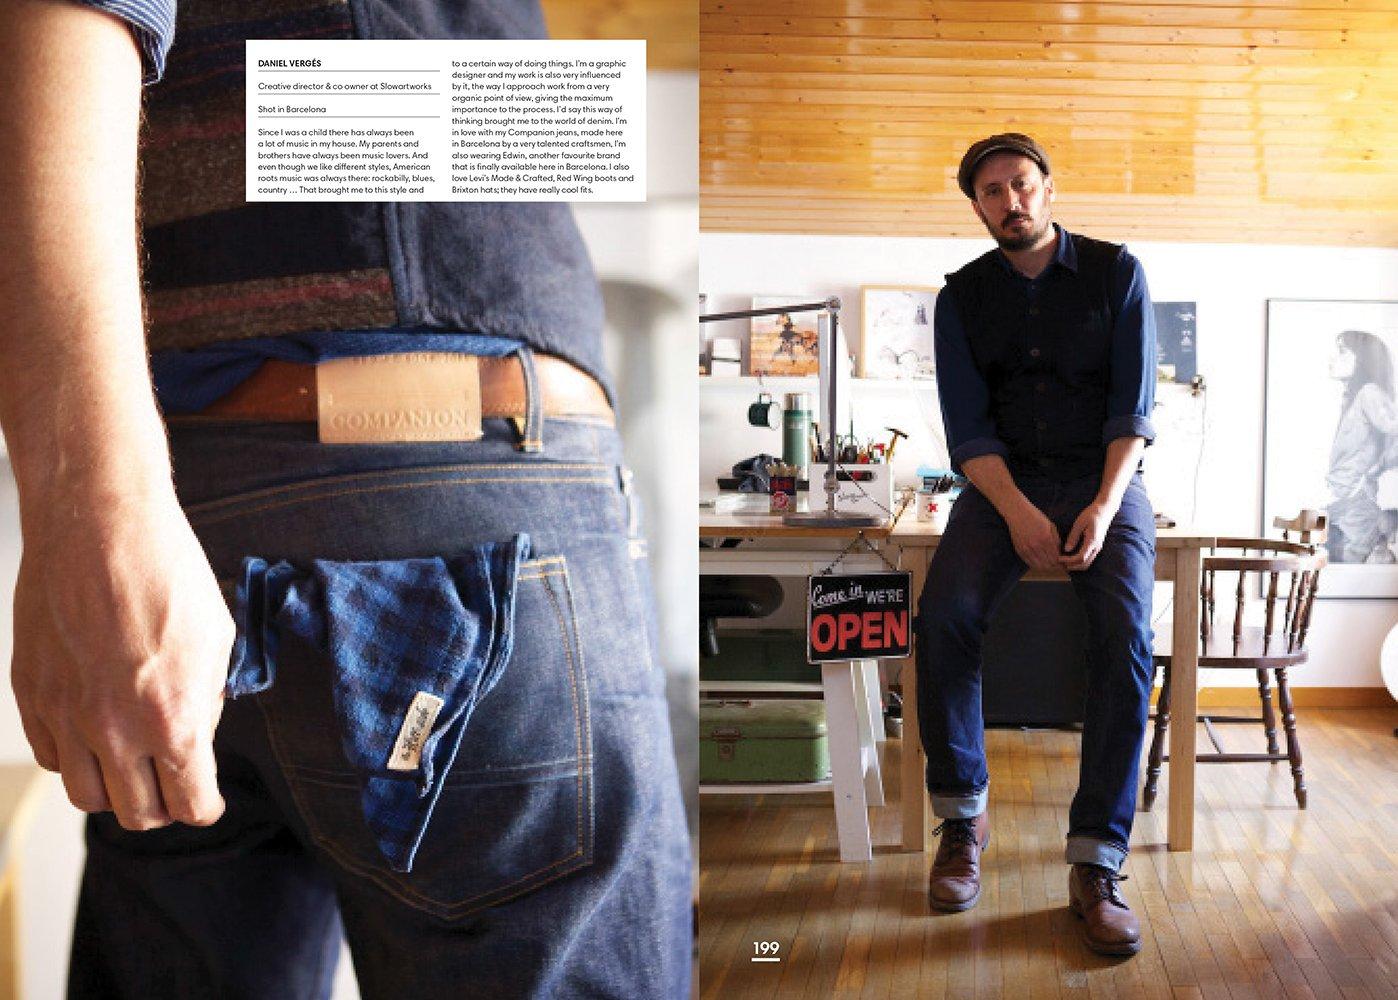 Denim Dudes Street Style Vintage Workwear Obsession Amy Leverton 9781780674186 Amazon Books